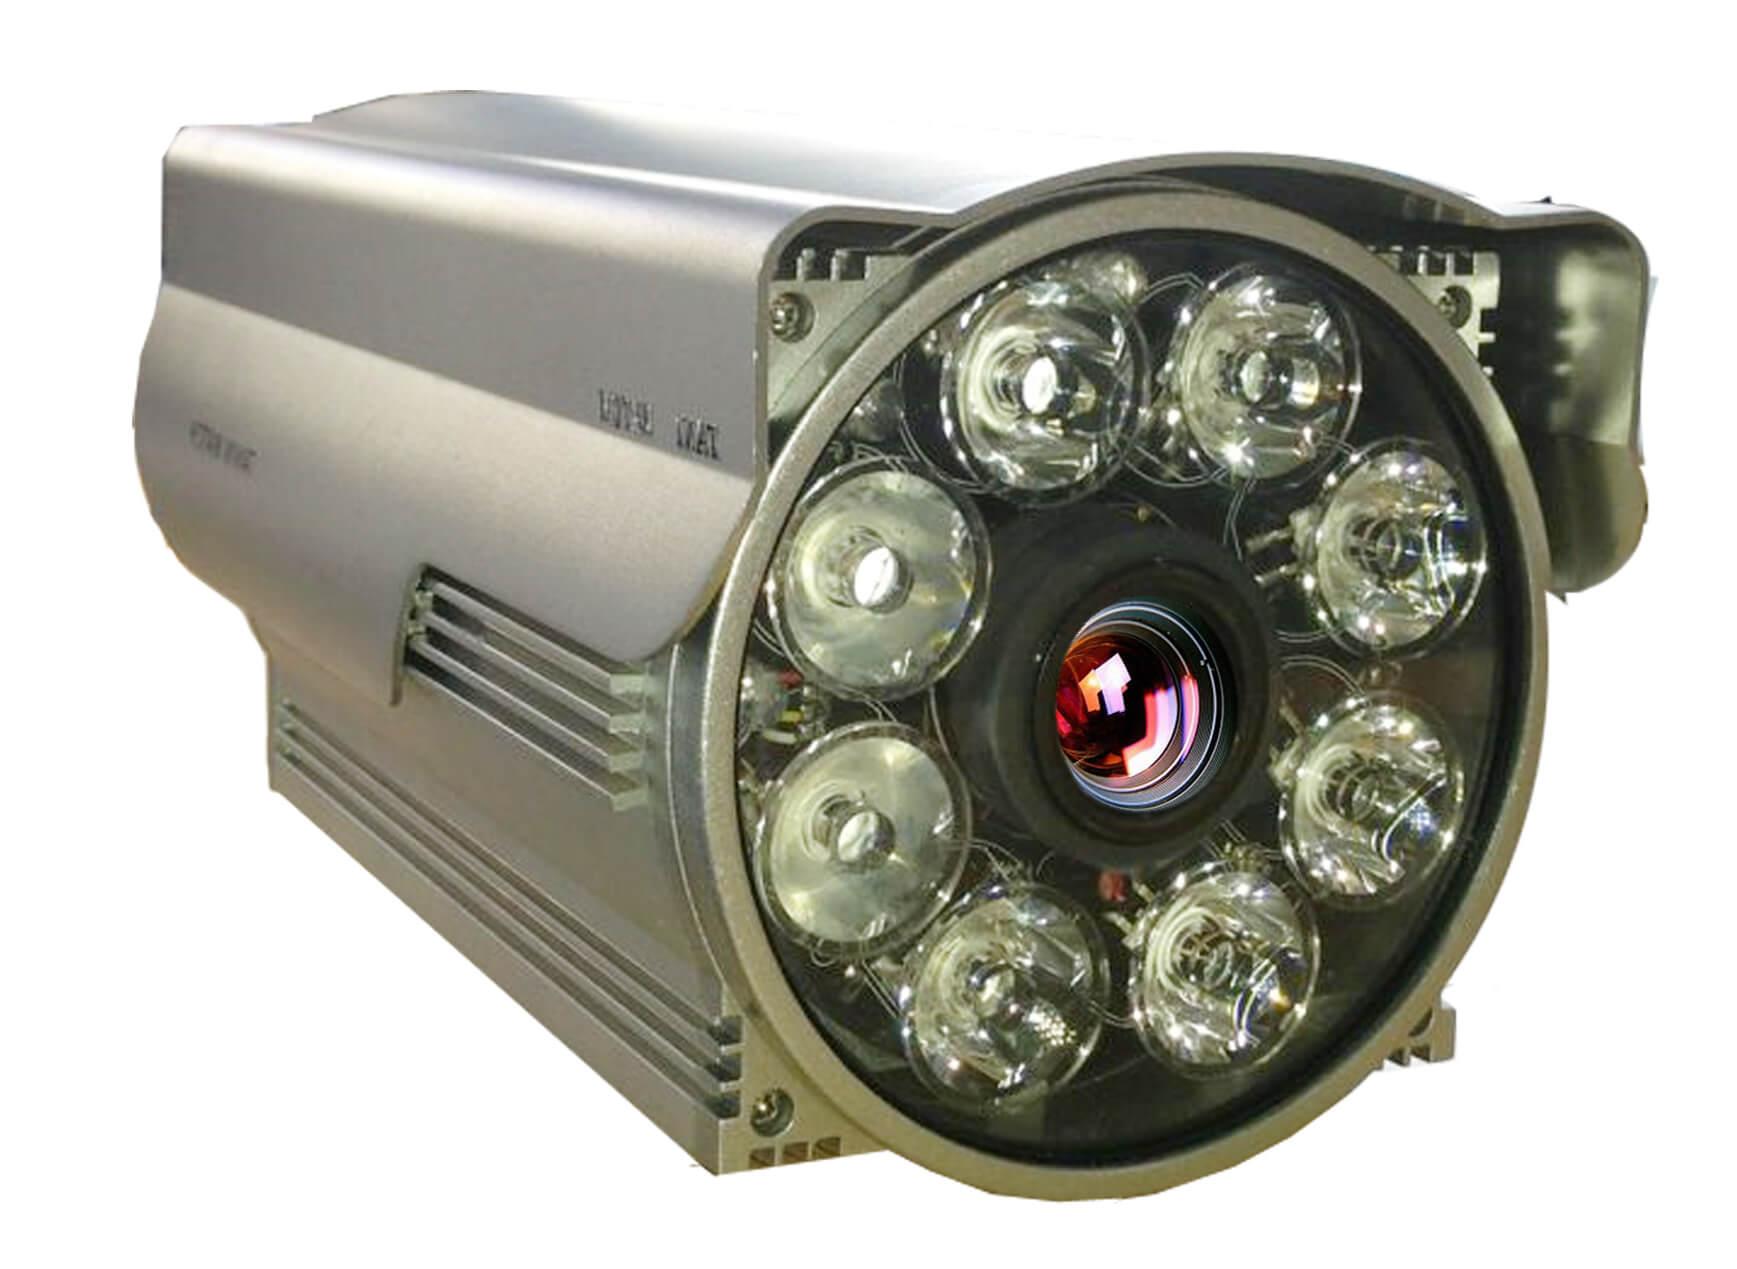 Biggest professional HD CCTV camera